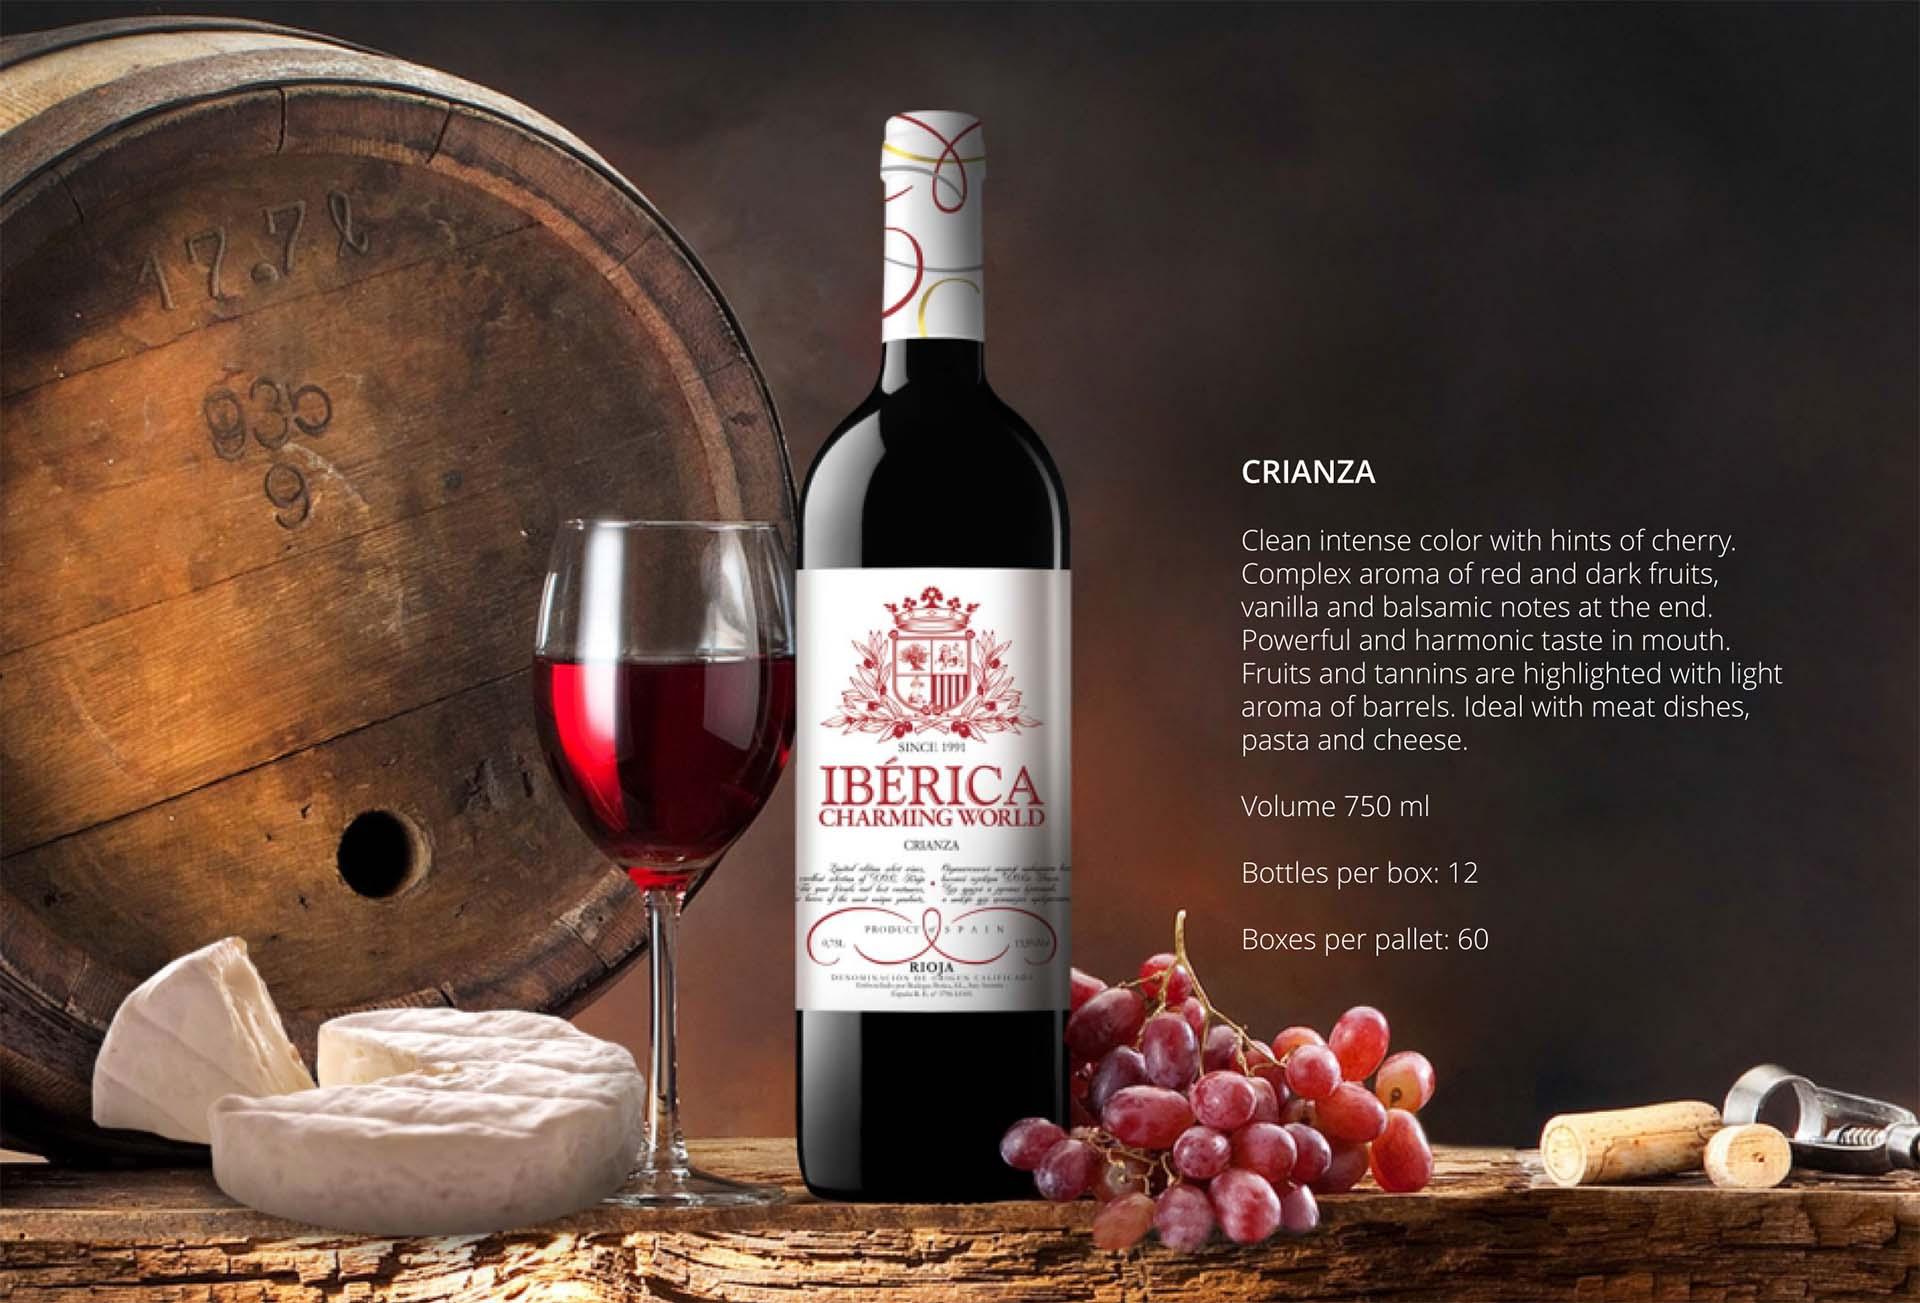 Iberica Catalogo de Vino 4